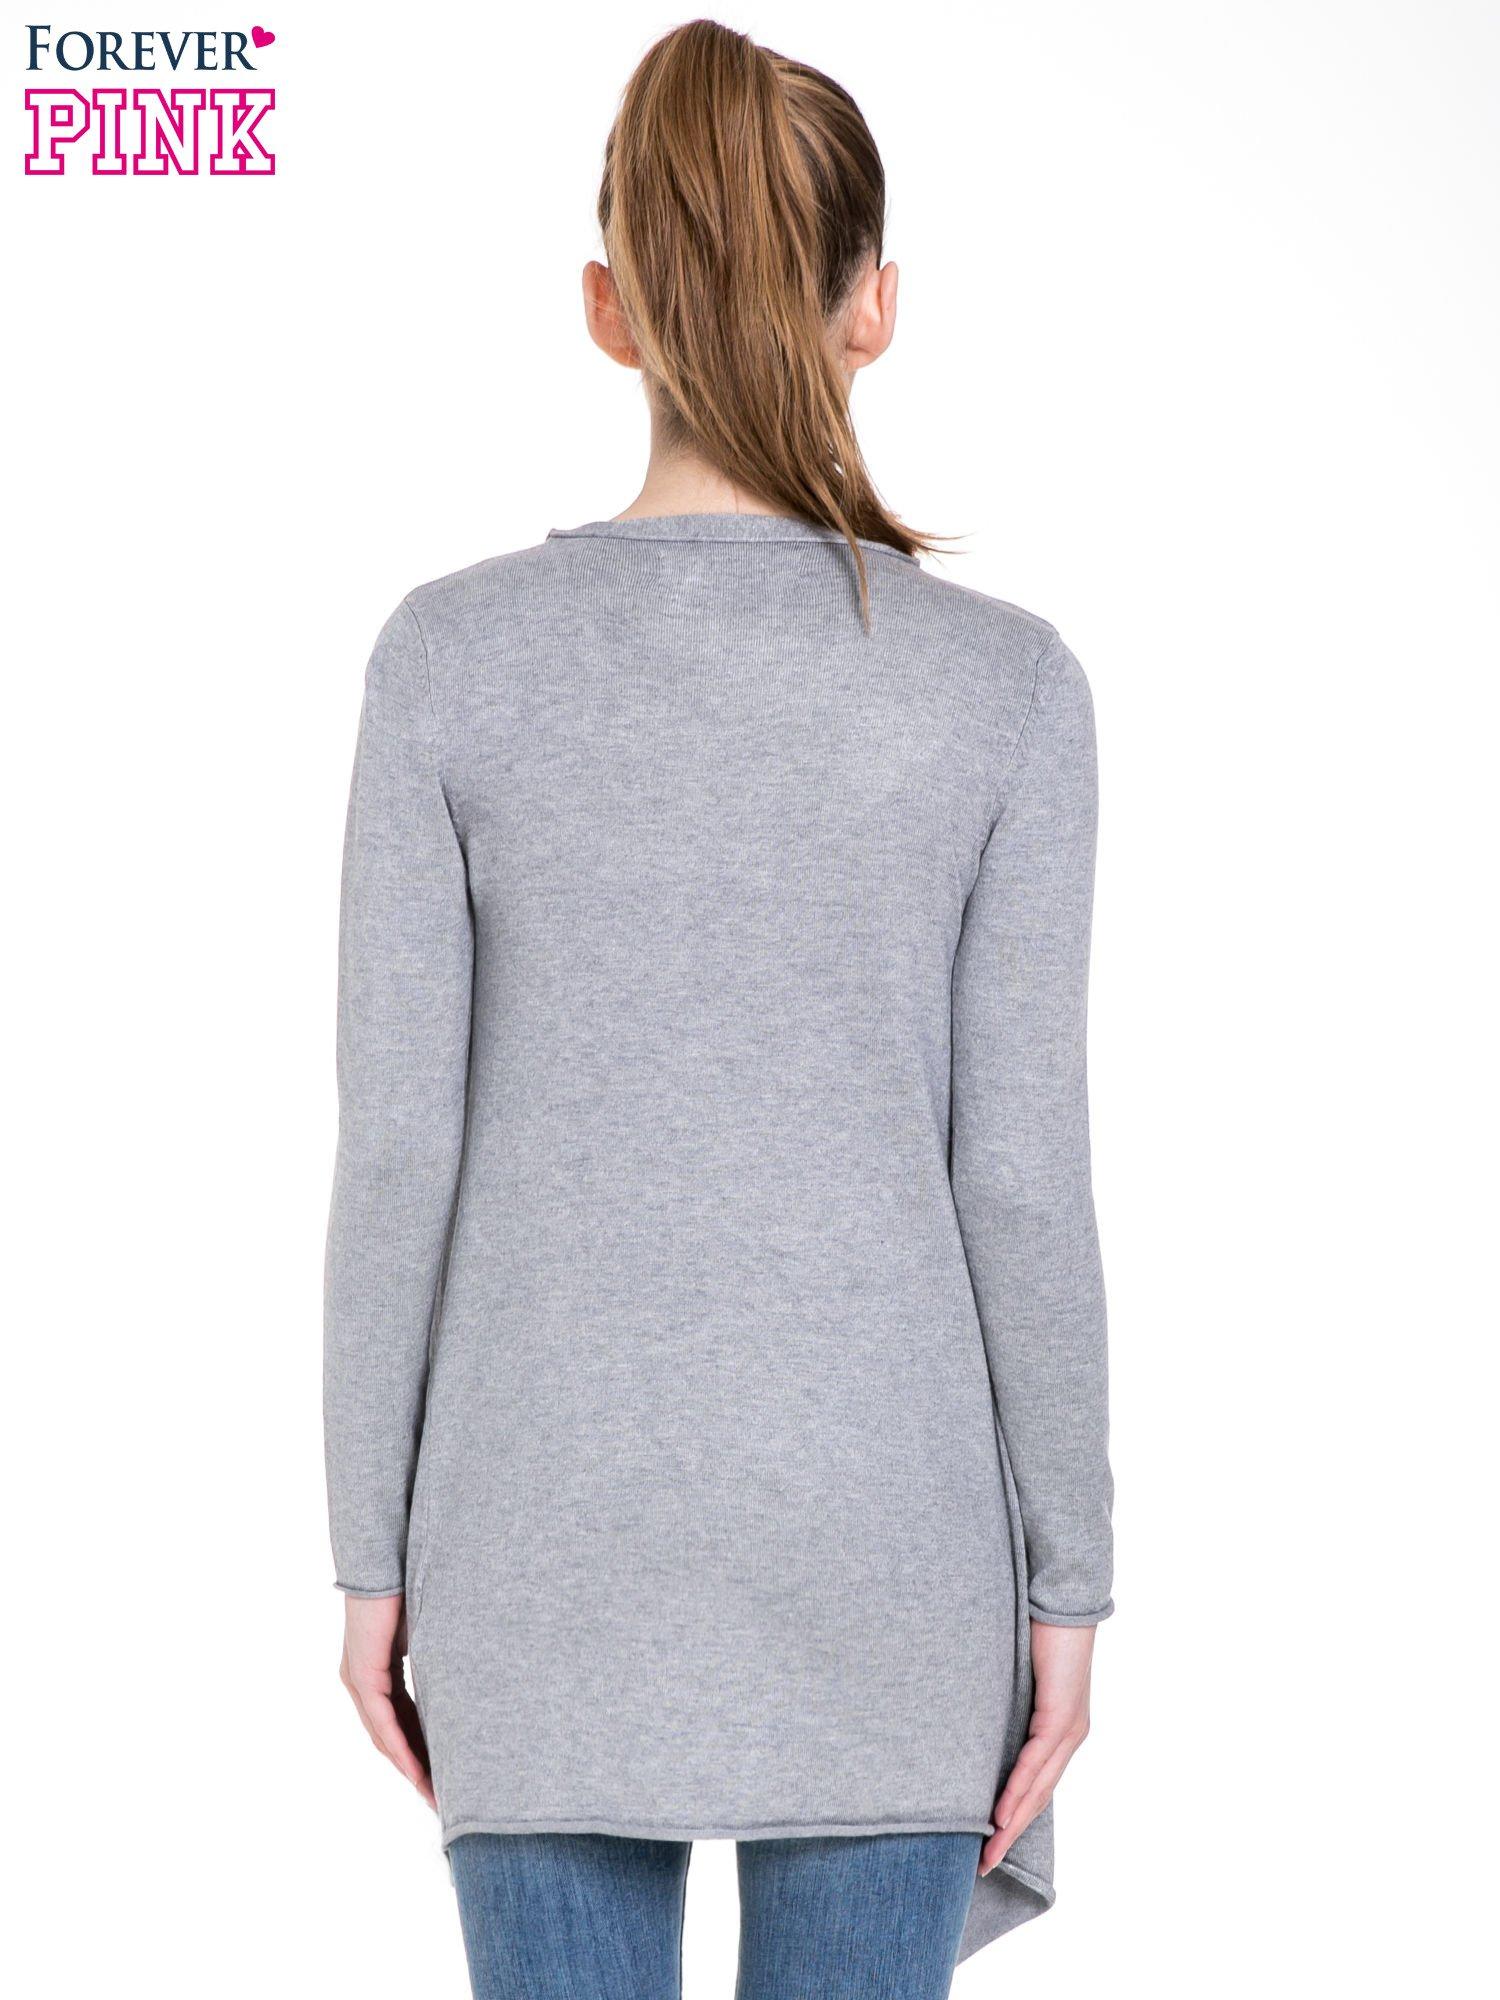 Szary sweter narzutka o kroju waterfall                                  zdj.                                  4